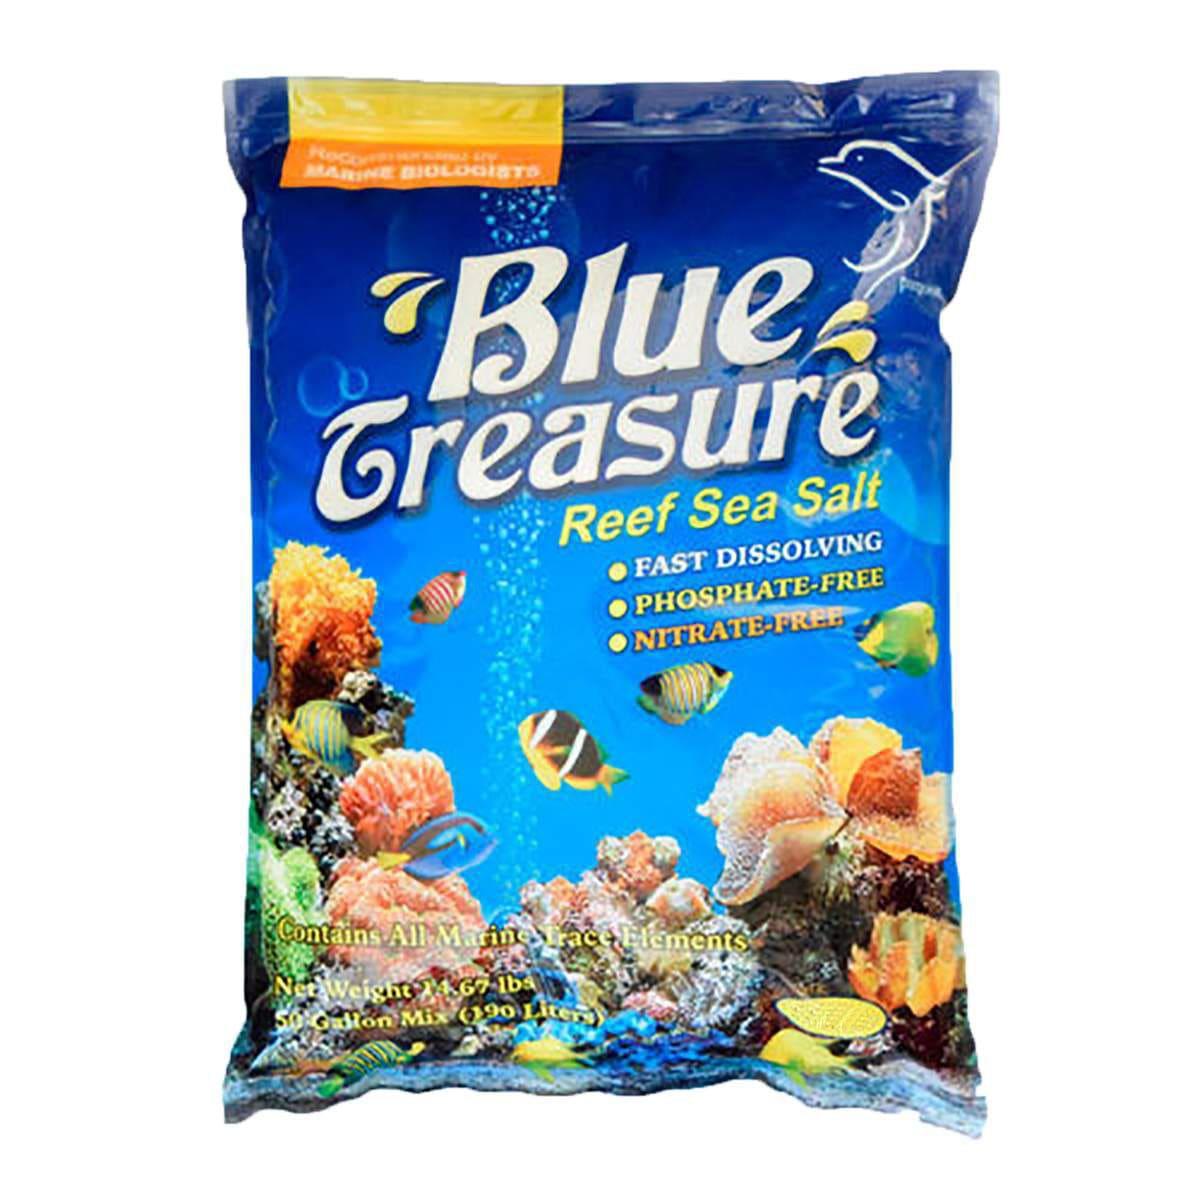 Blue Treasure Reef Sea Salt 3,35kg + Brinde